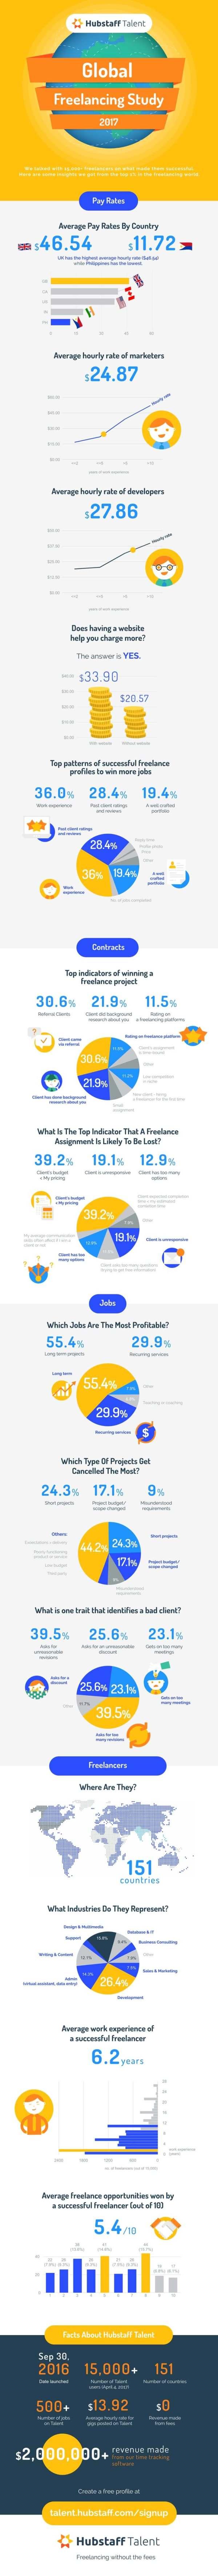 rsz_hubstaffs-freelancing-trends-2017-tentative-title-infographic